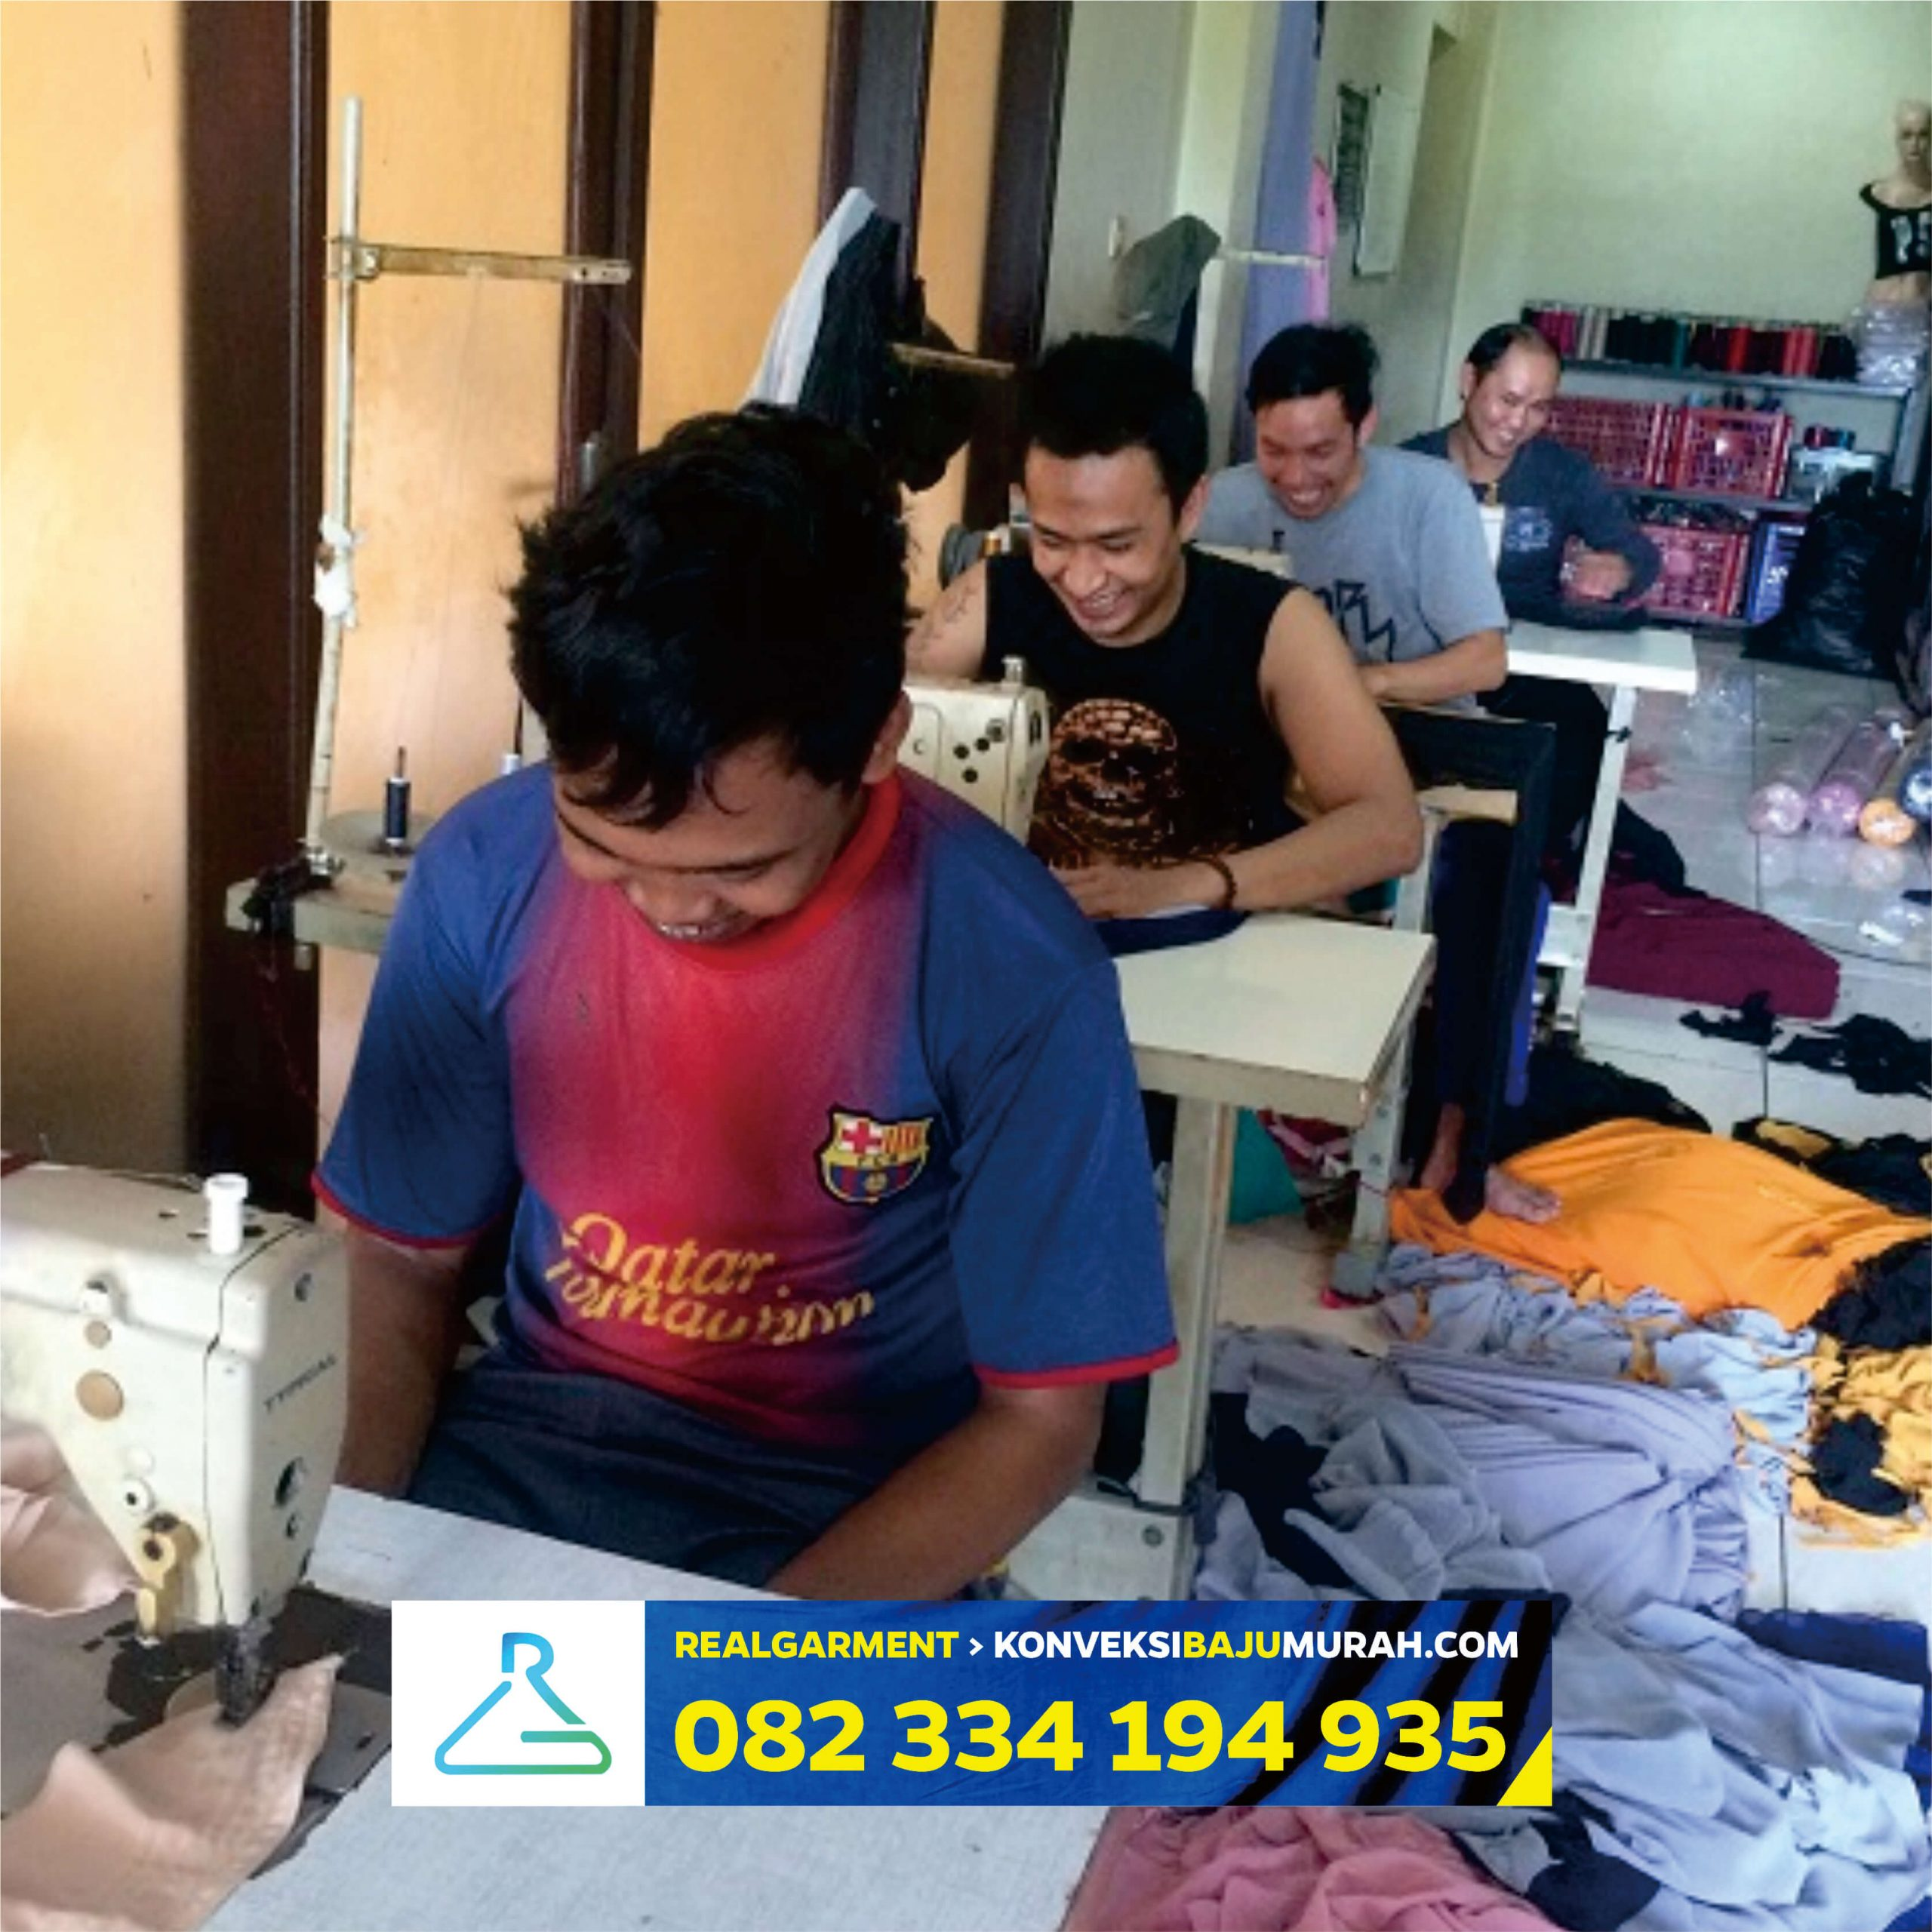 Pabrik Baju Hazmat Lumajang